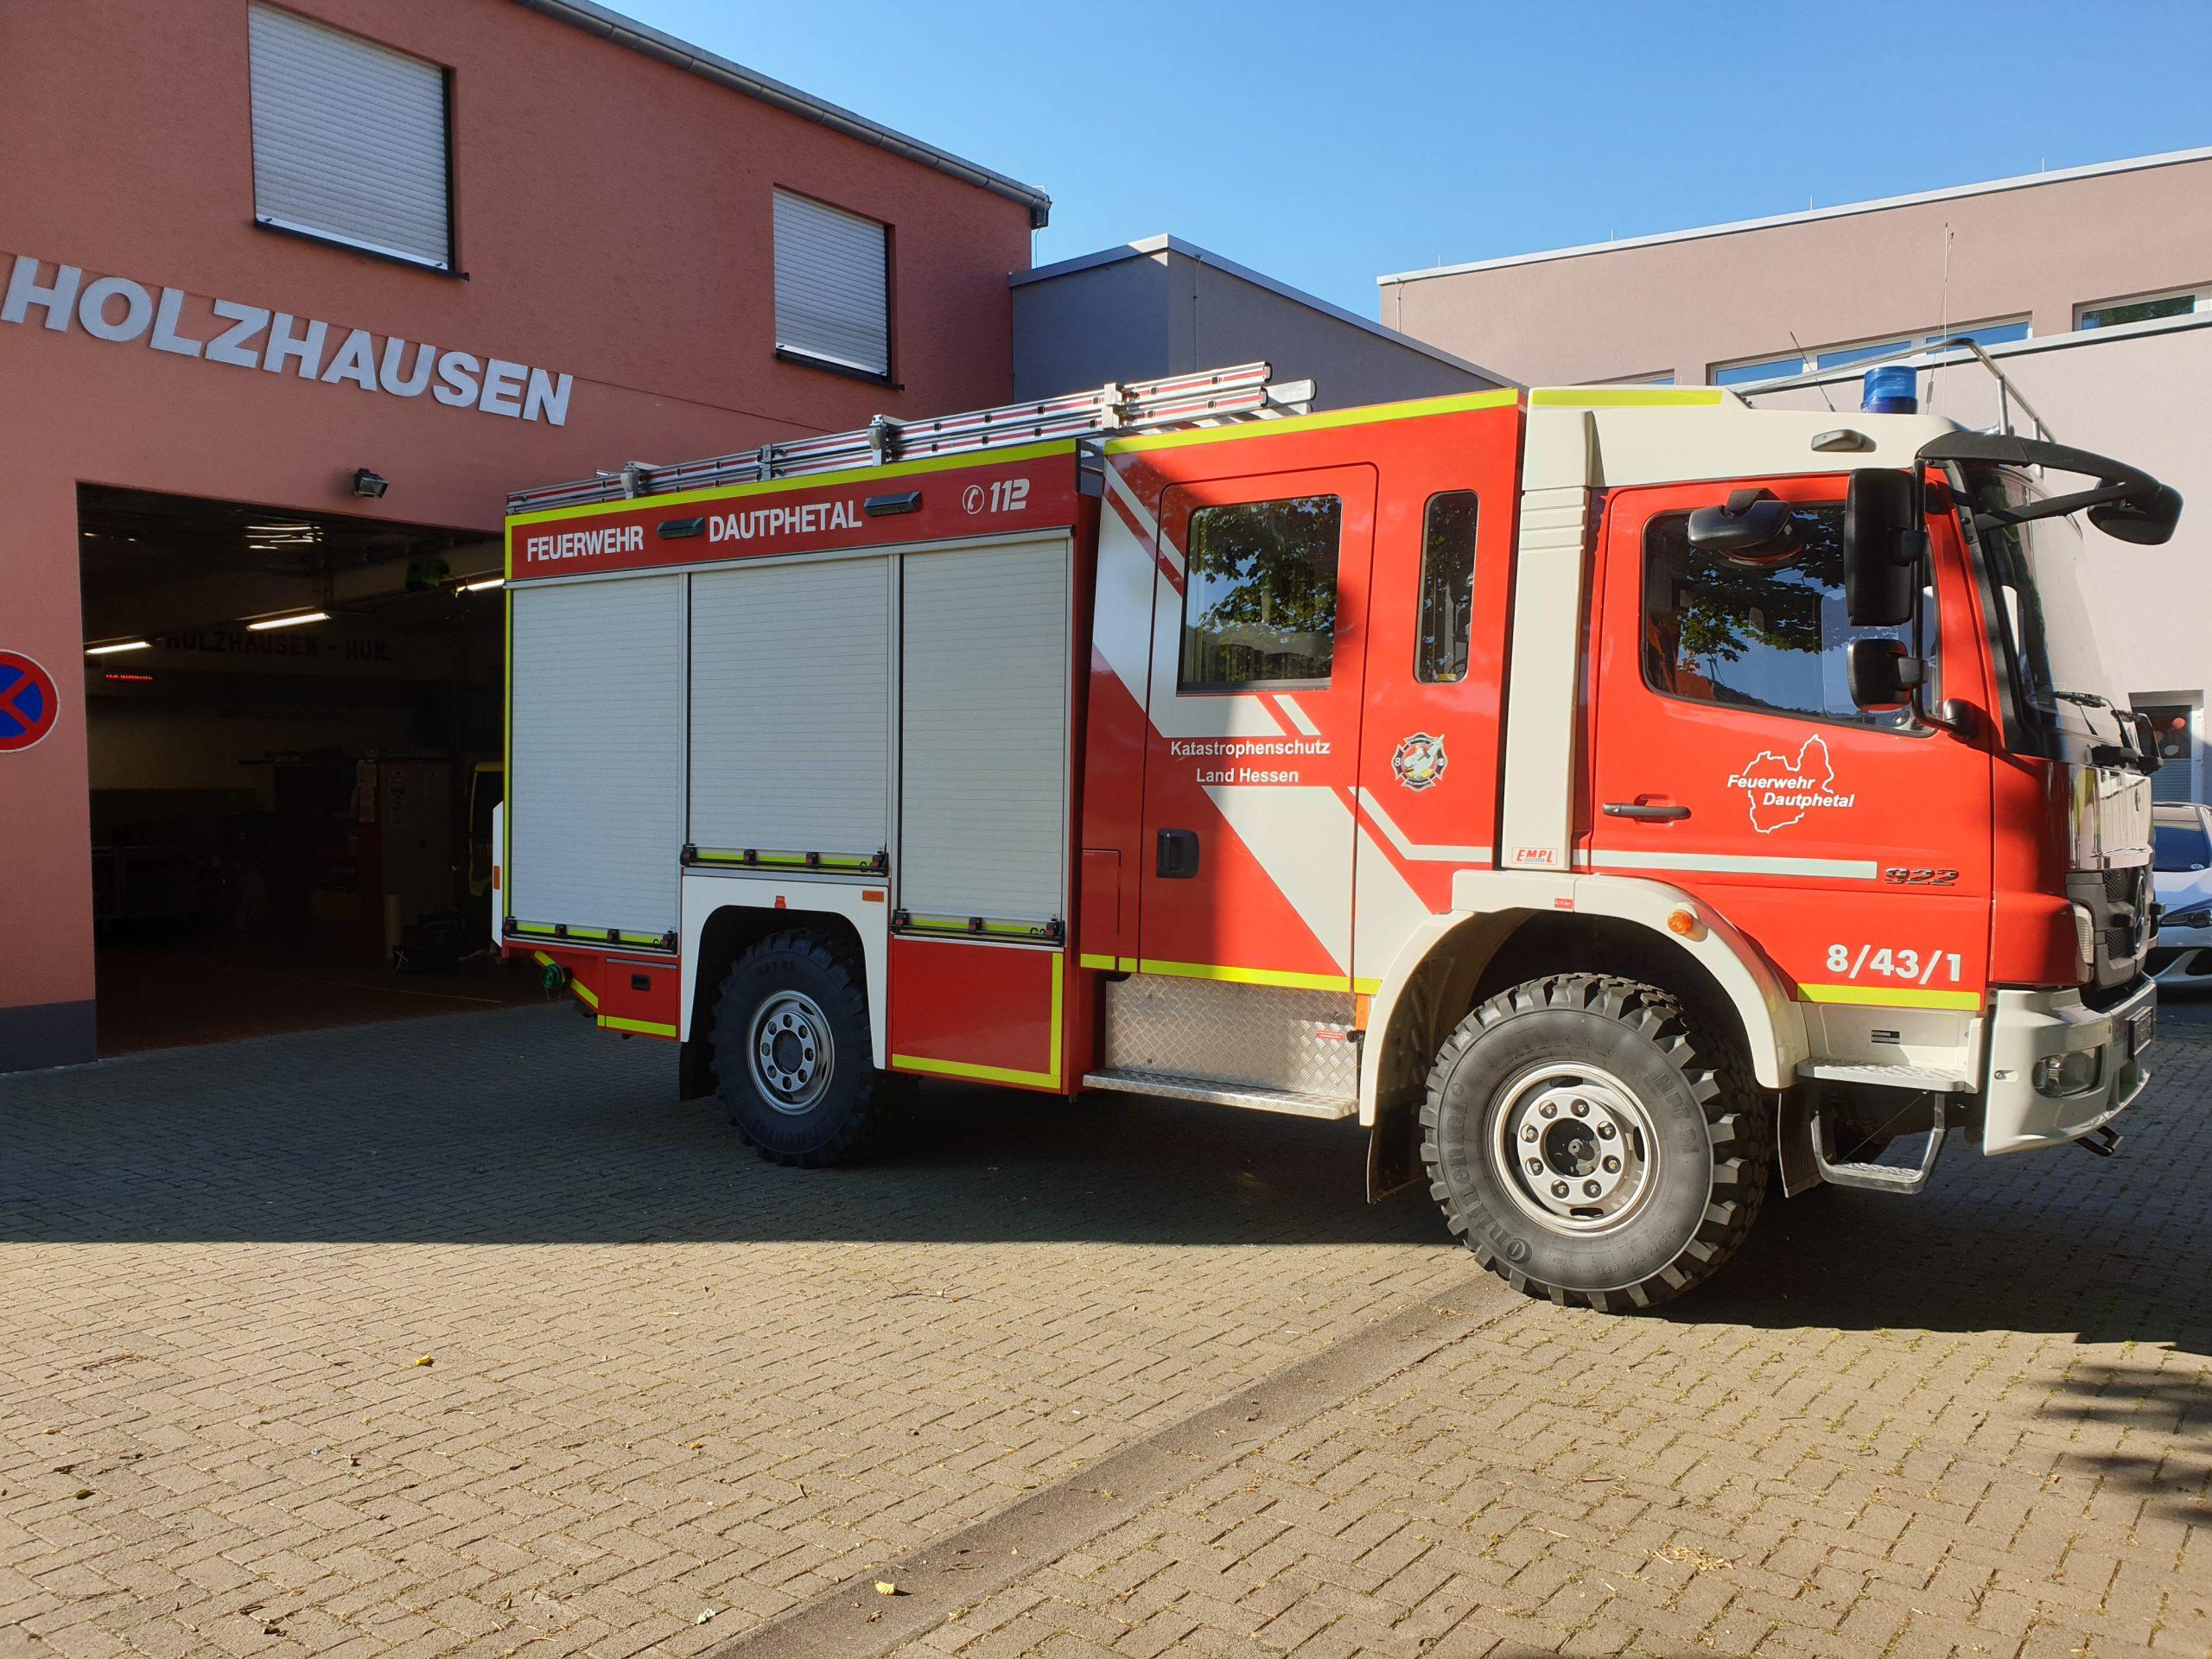 #0020 - LF10KatS Hessen FF Dautphetal, OT Holzhausen